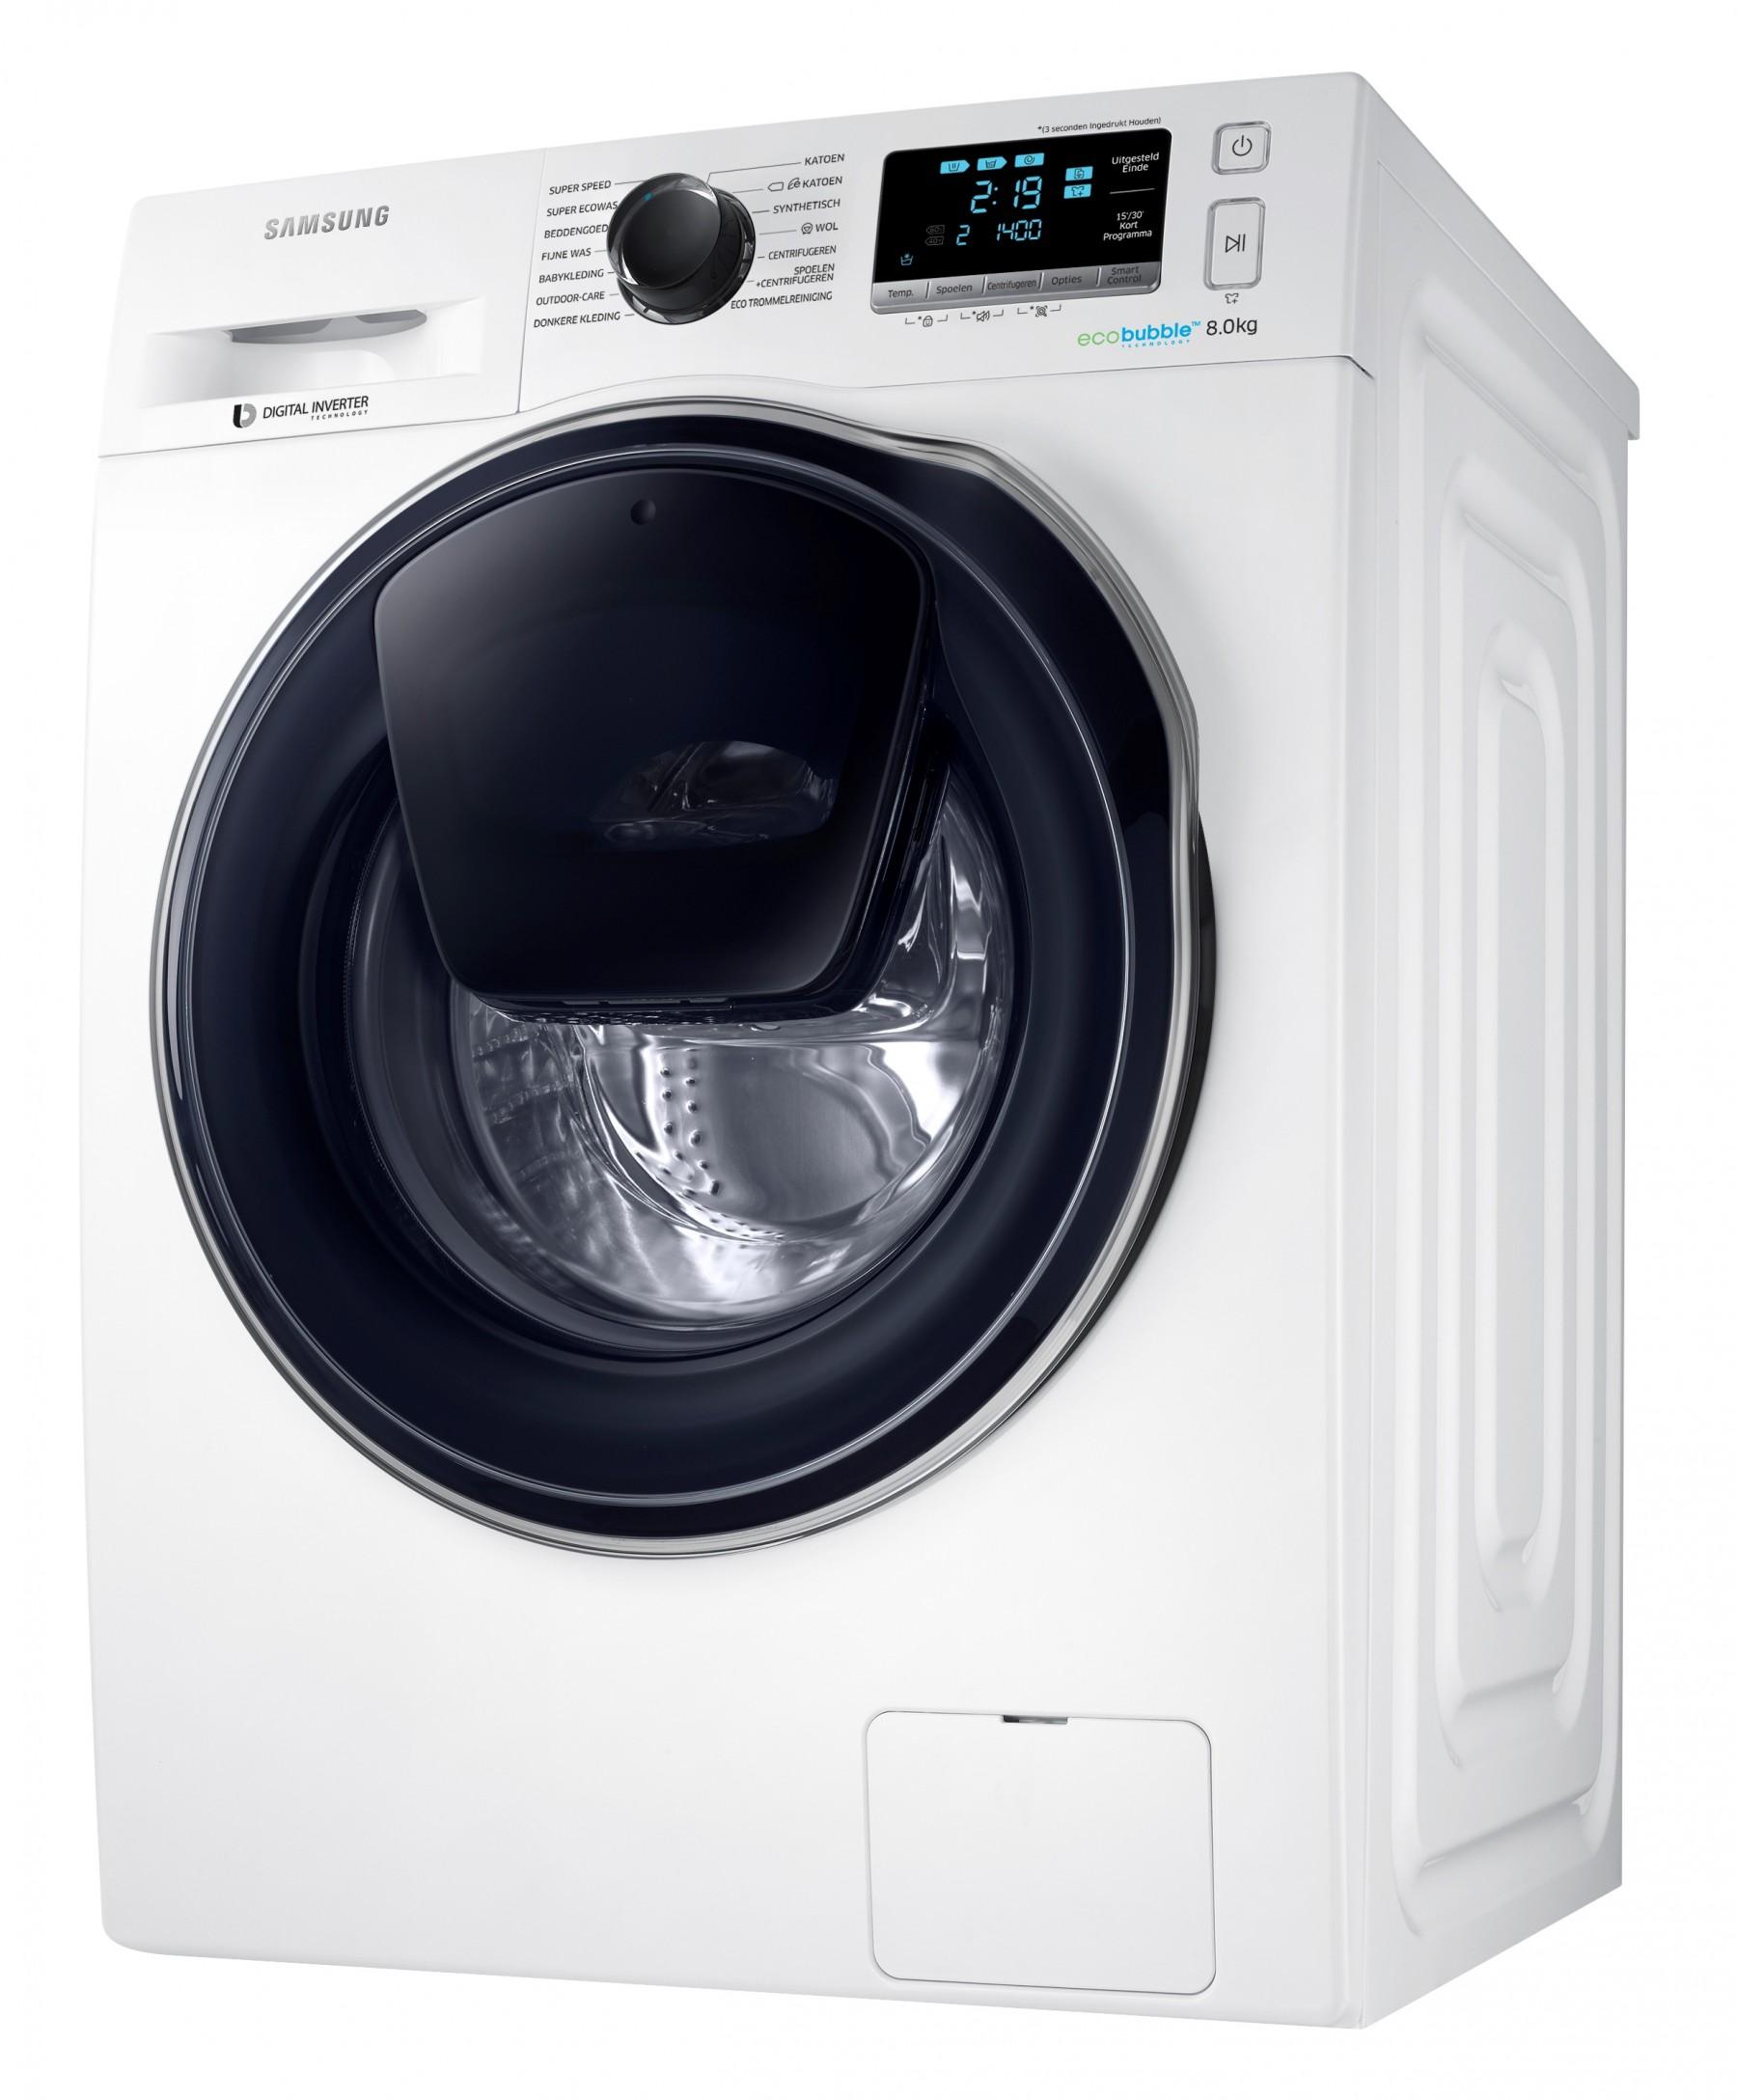 average weight of a washing machine